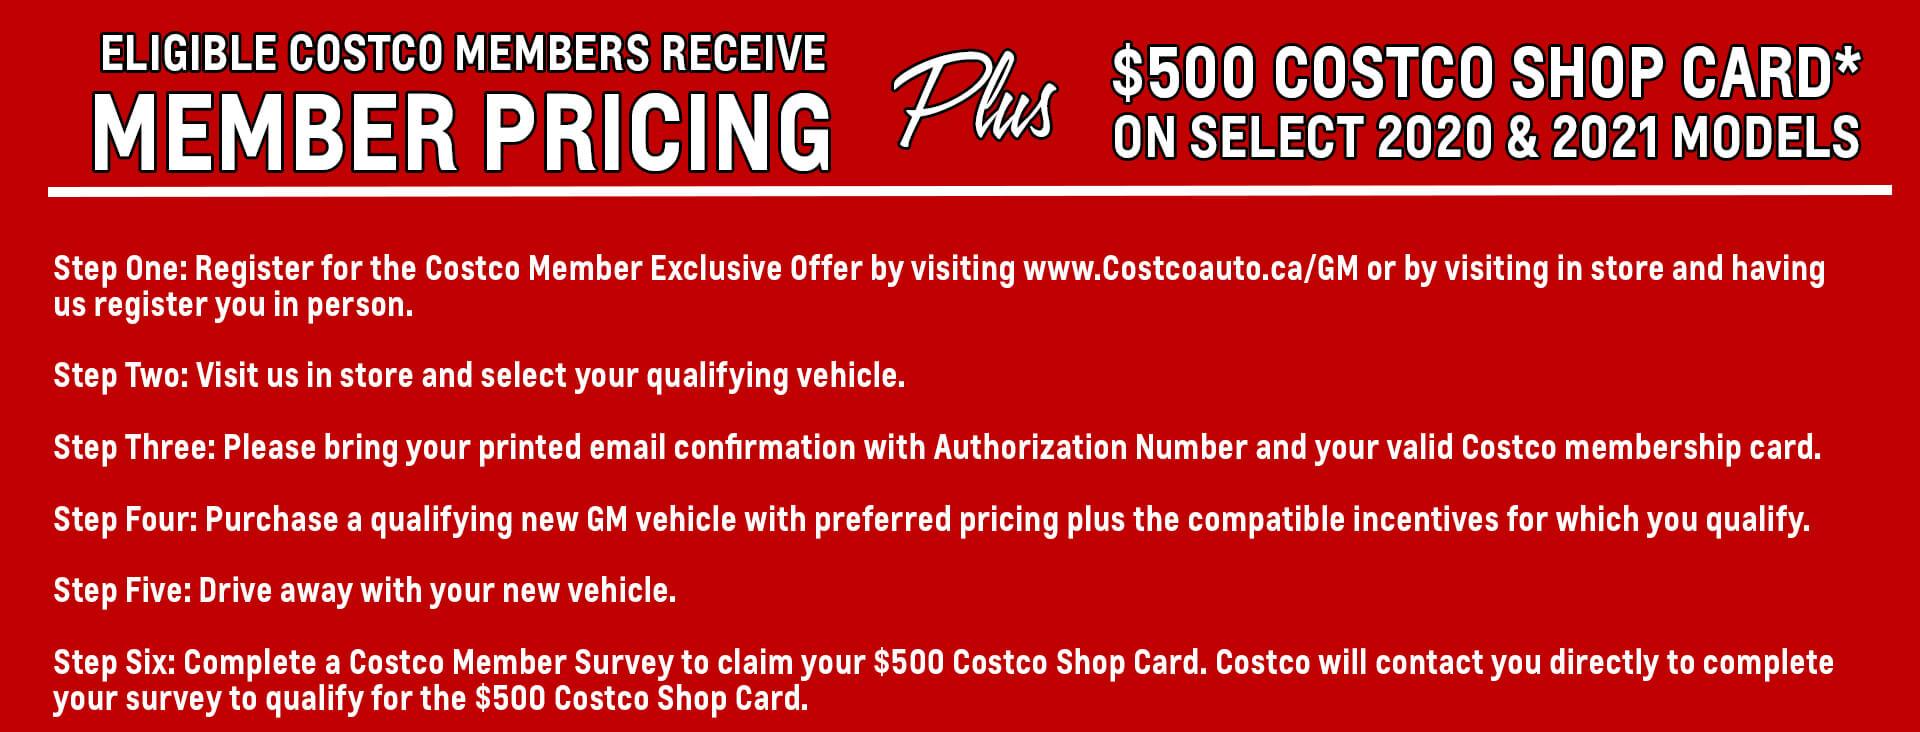 Costco Member Pricing Gsl Gm City